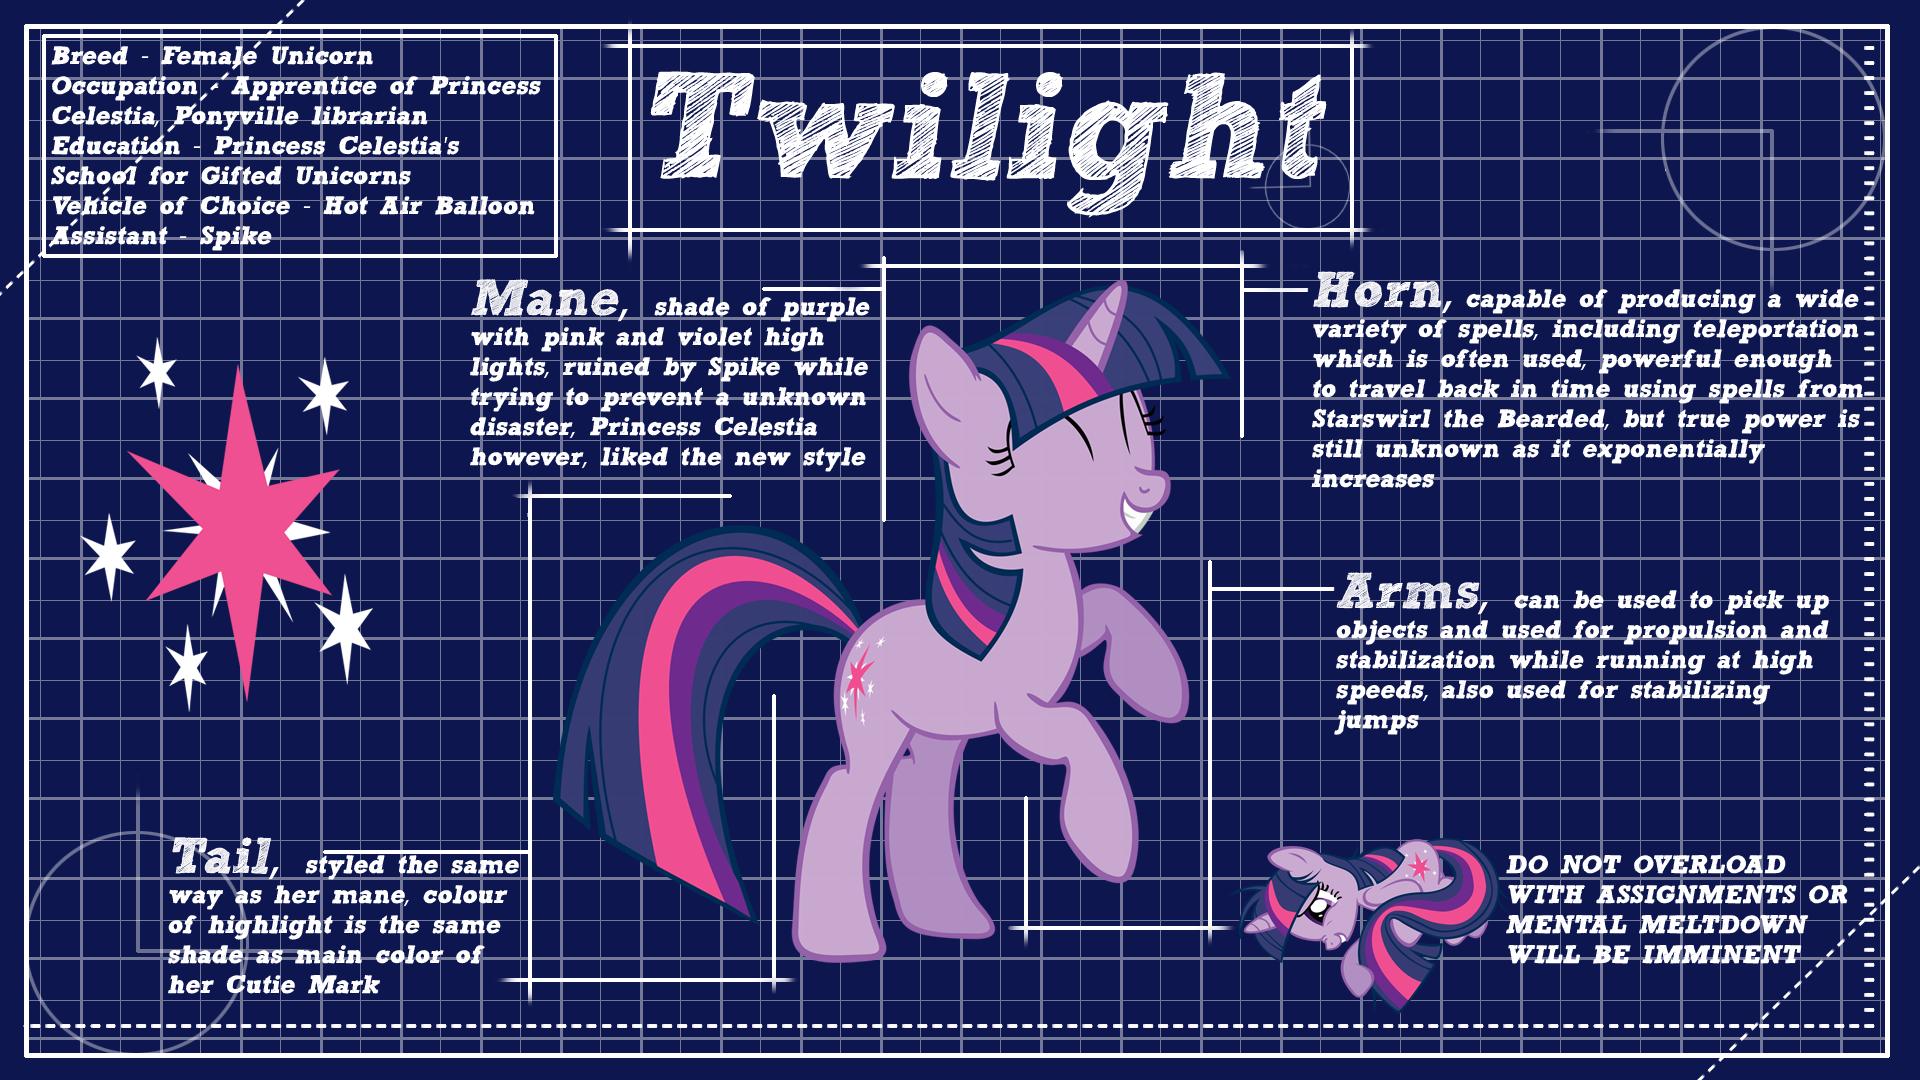 Twilight Design by BlackGryph0n, ikonradx and jeosadn